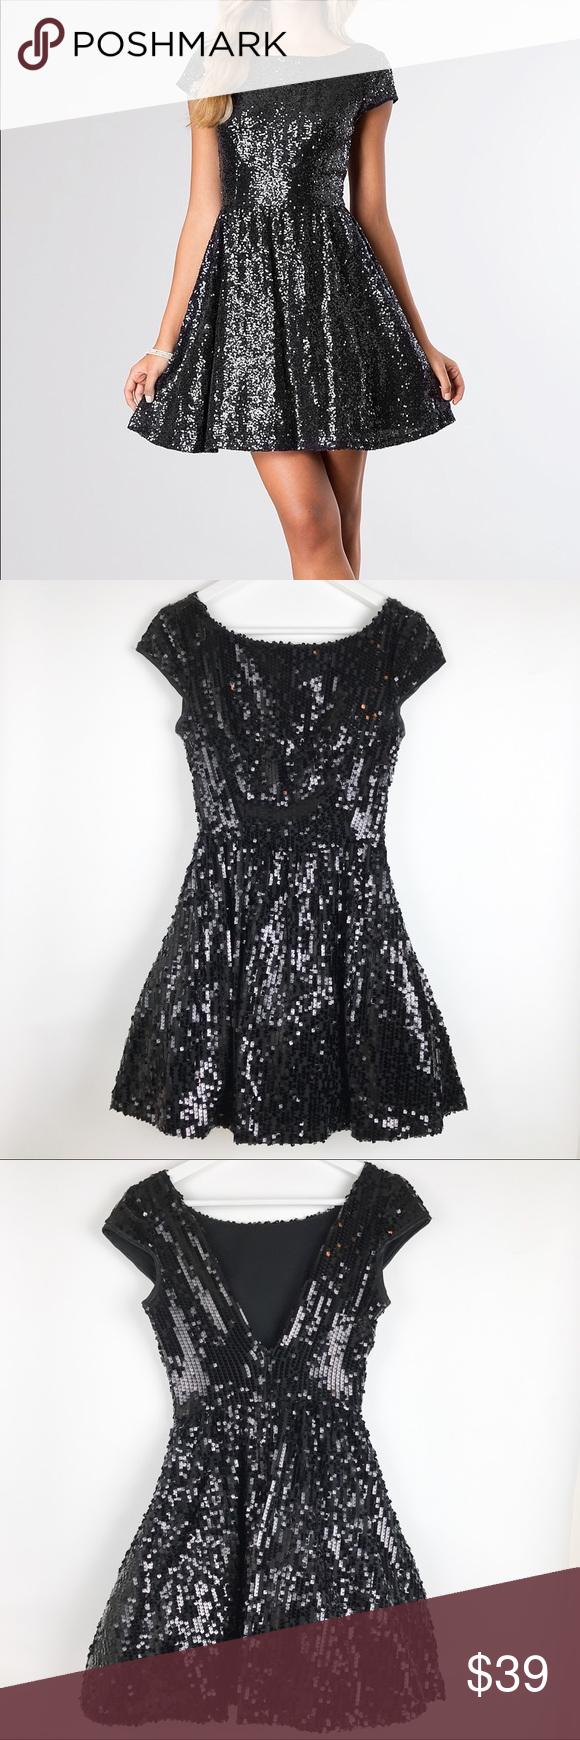 B darlin black lace dress  B Darlin Cap Sleeve Sequined Dress  Cap Conditioner and Customer